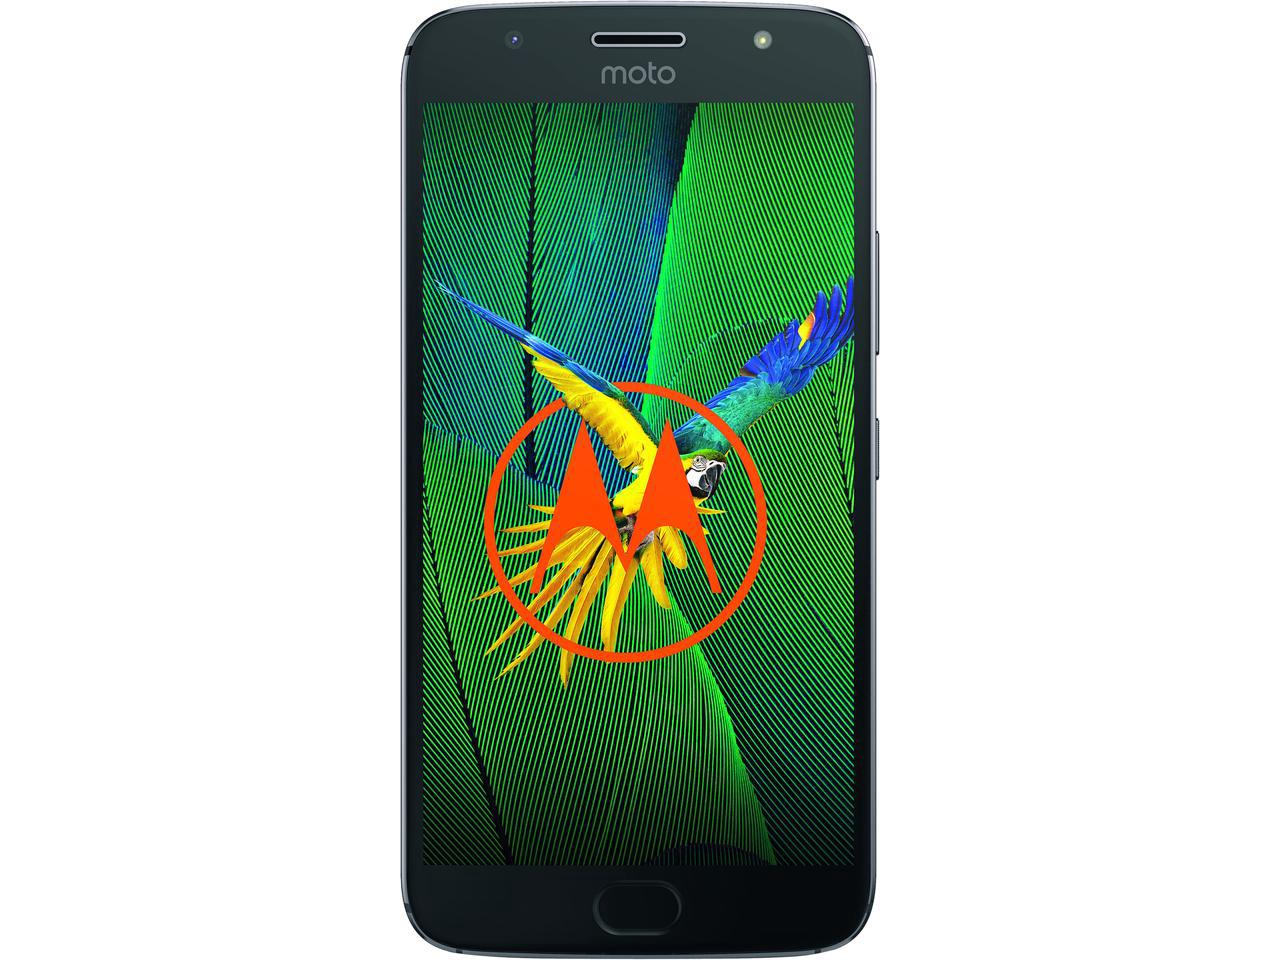 Motorola Moto G5S Plus product image